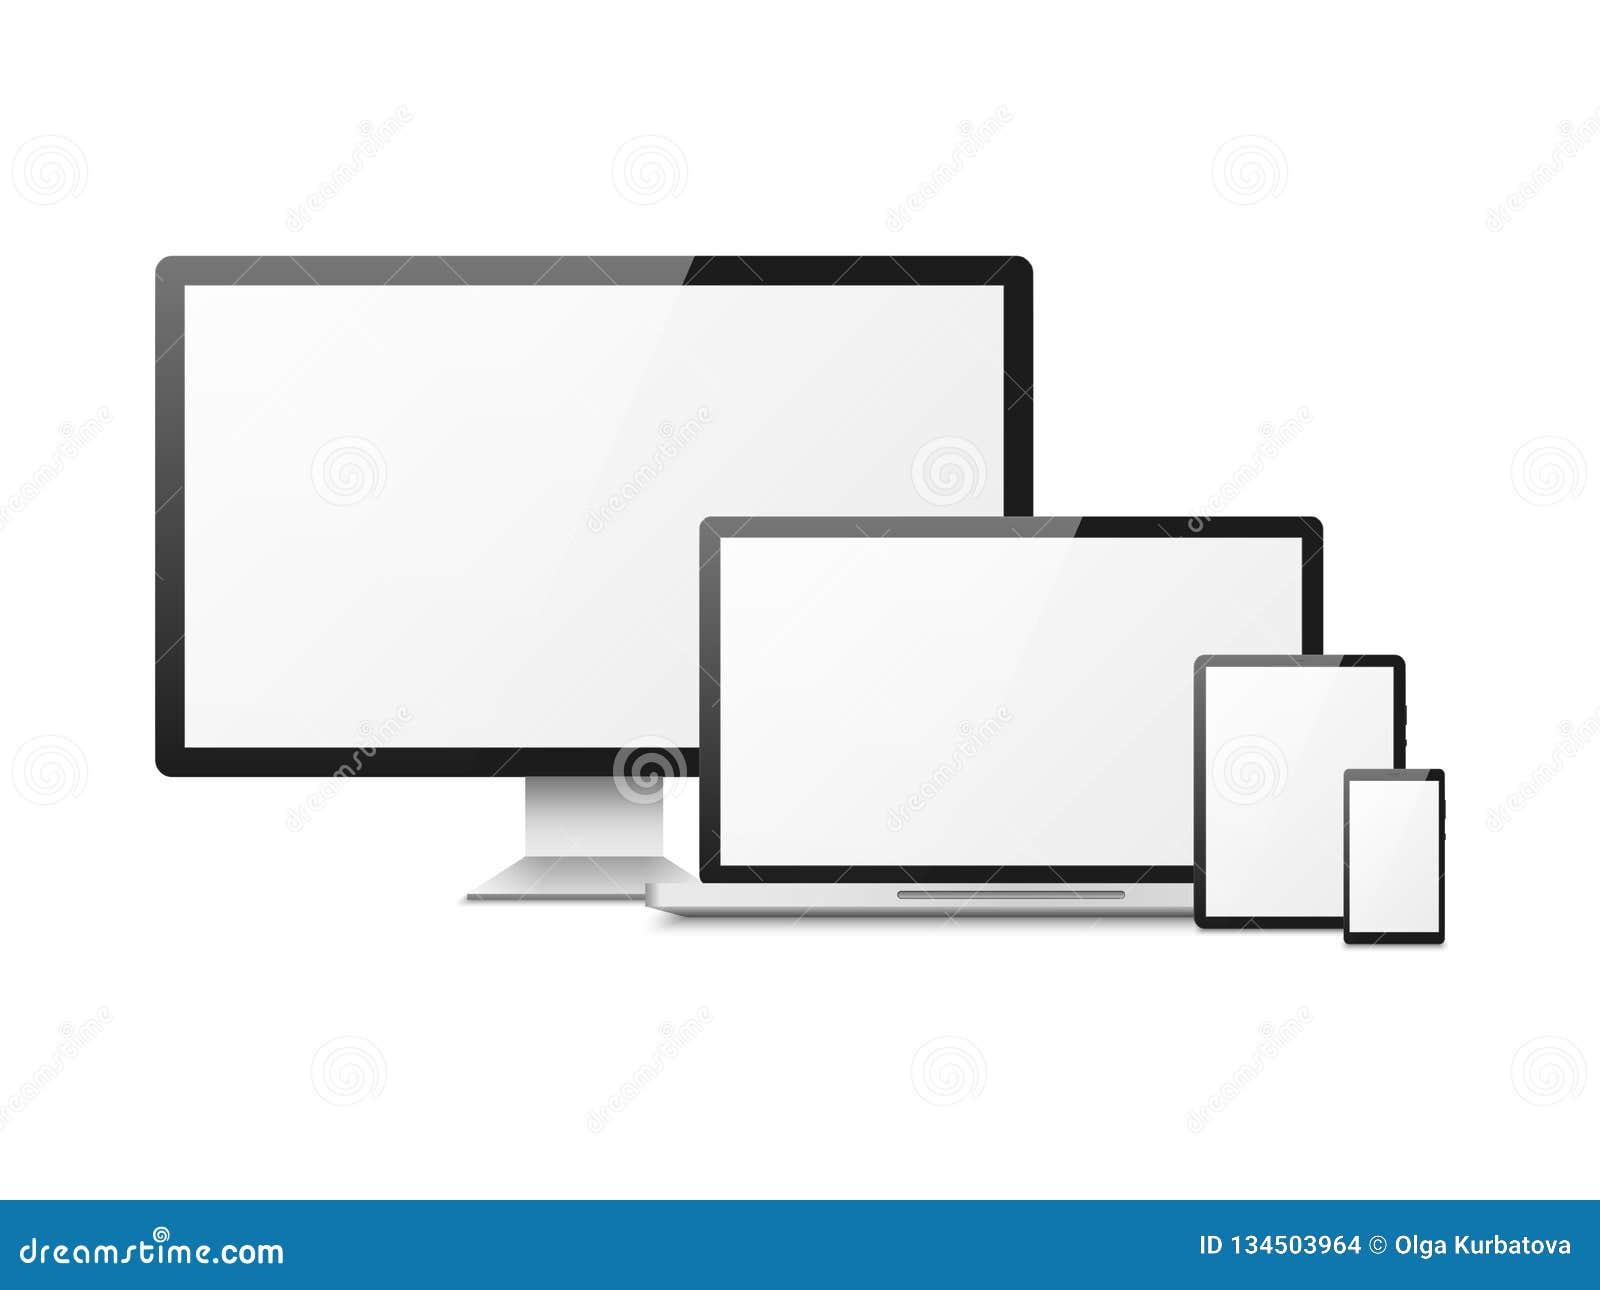 Realistischer Computer Gerätlaptoptablettentelefon Smartphonemonitor, Computertischplattenschirm, entgegenkommender Netzplan